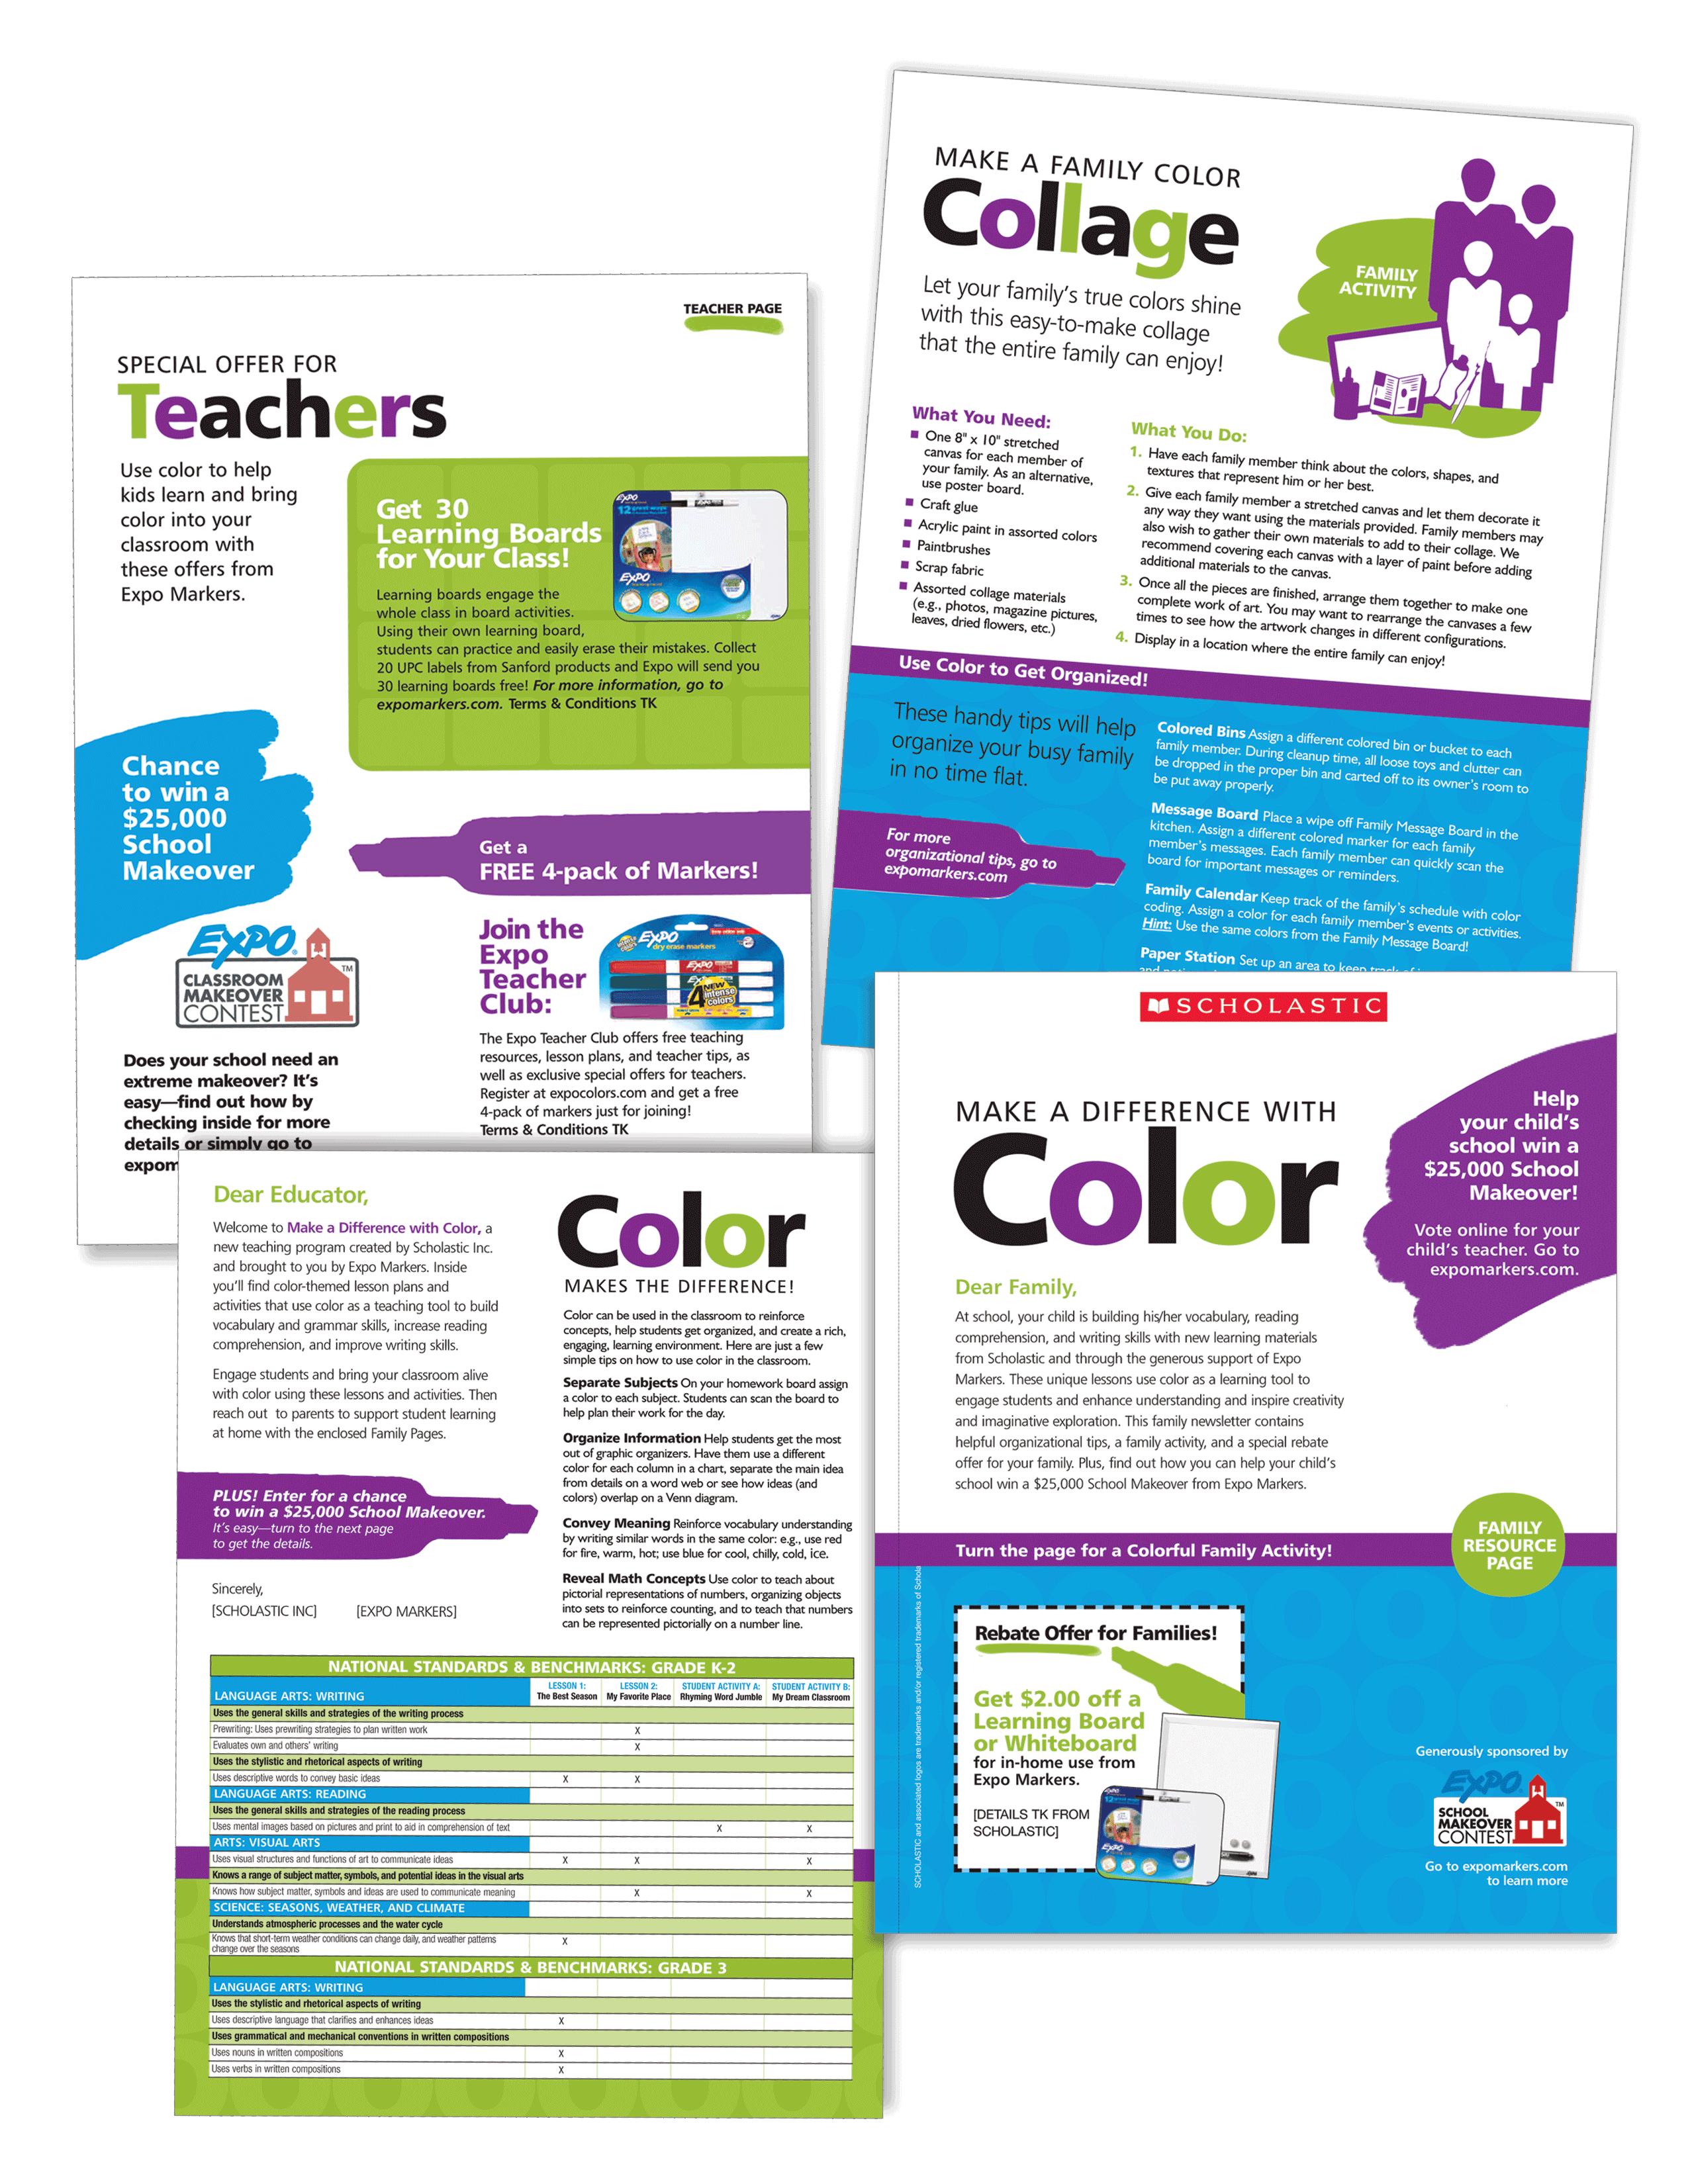 CurlyQ Creative - EDITORIAL DESIGN: Scholastic & Expo